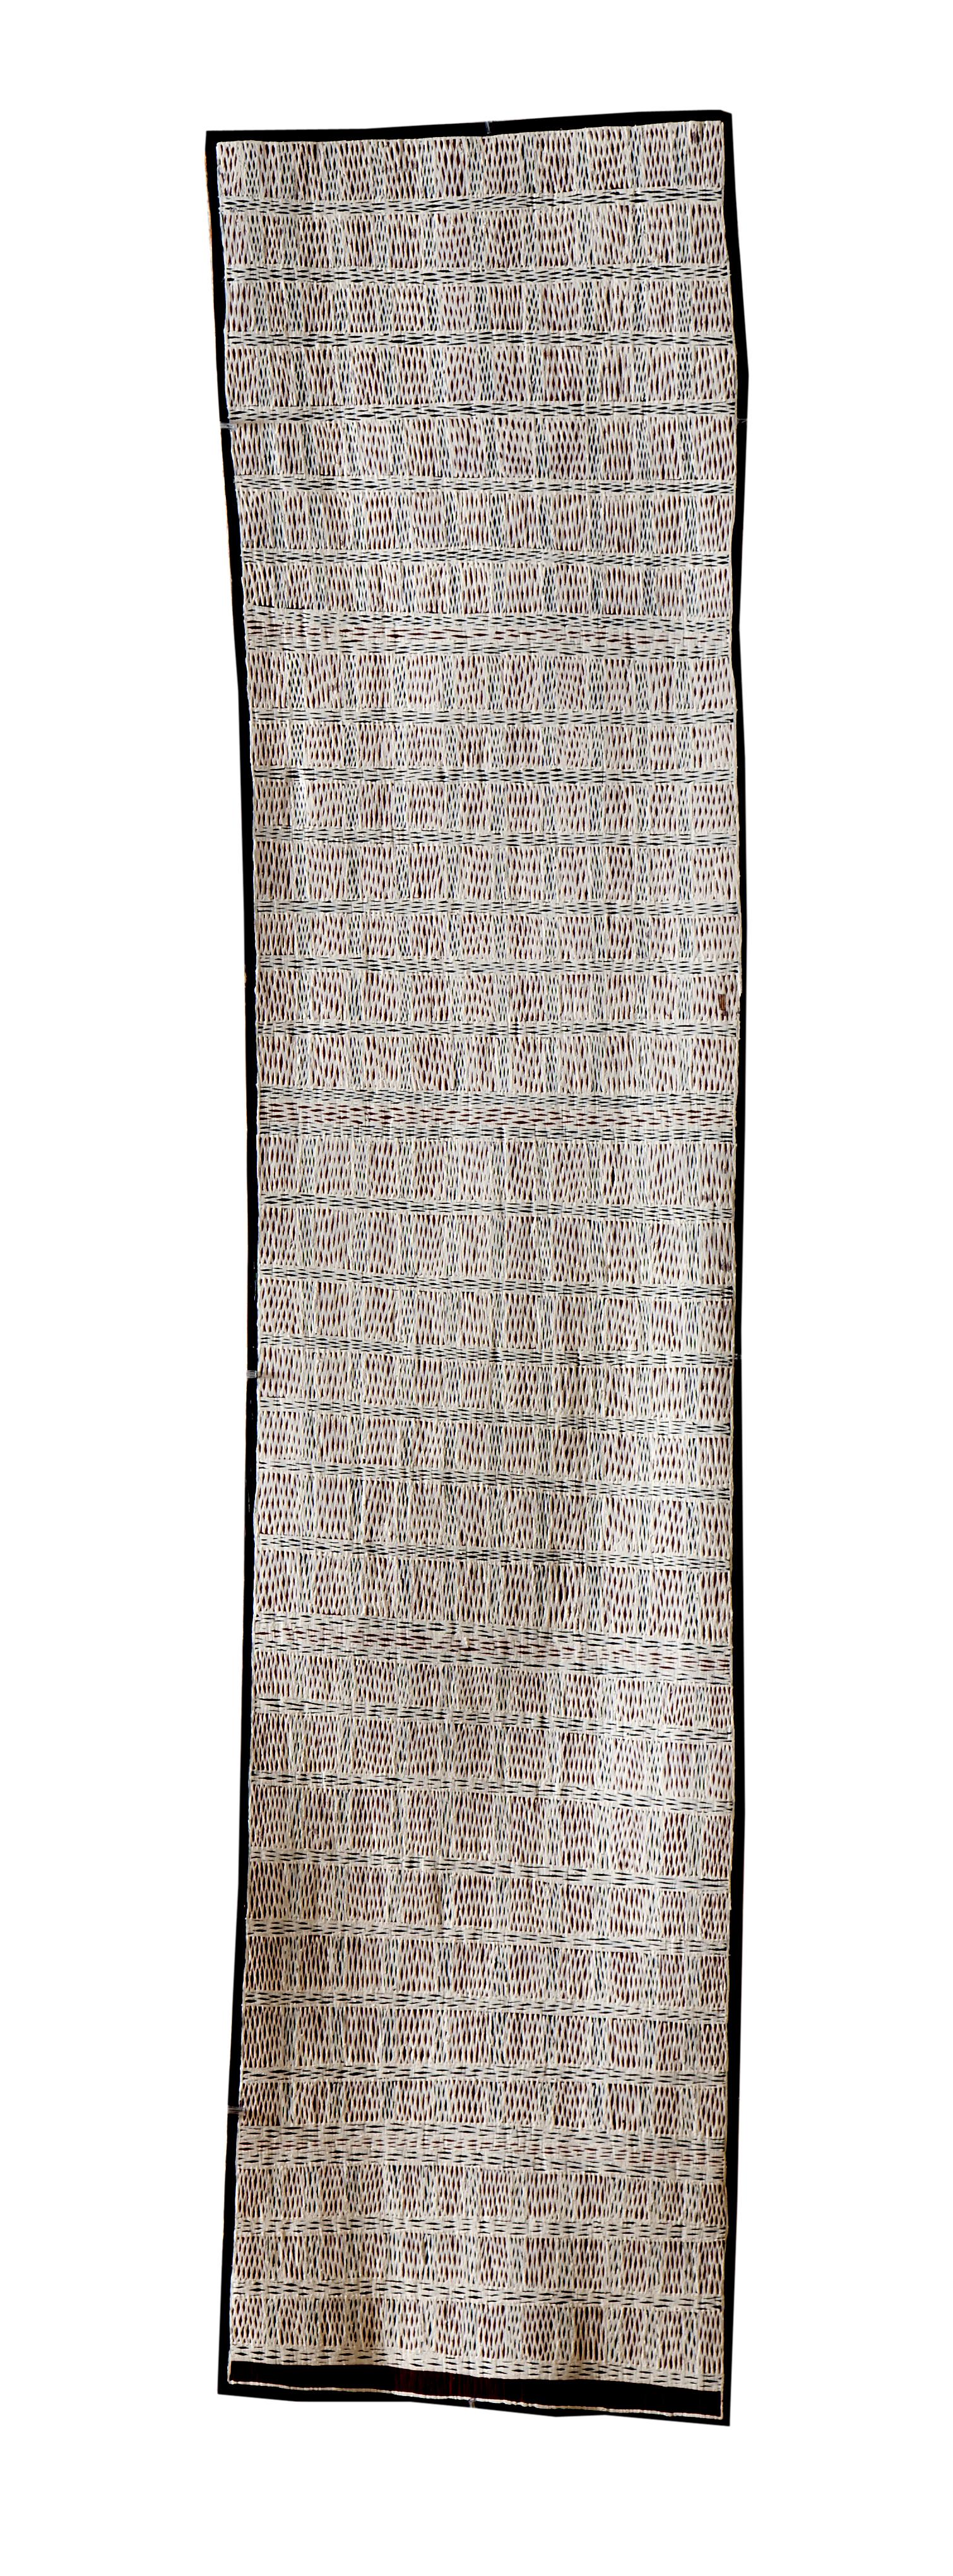 Marrnyula Munungurr  Untitled  Natural earth pigments on bark 36 x 160cm  Buku Larrnggay Mulka #4072P   EMAIL INQUIRY